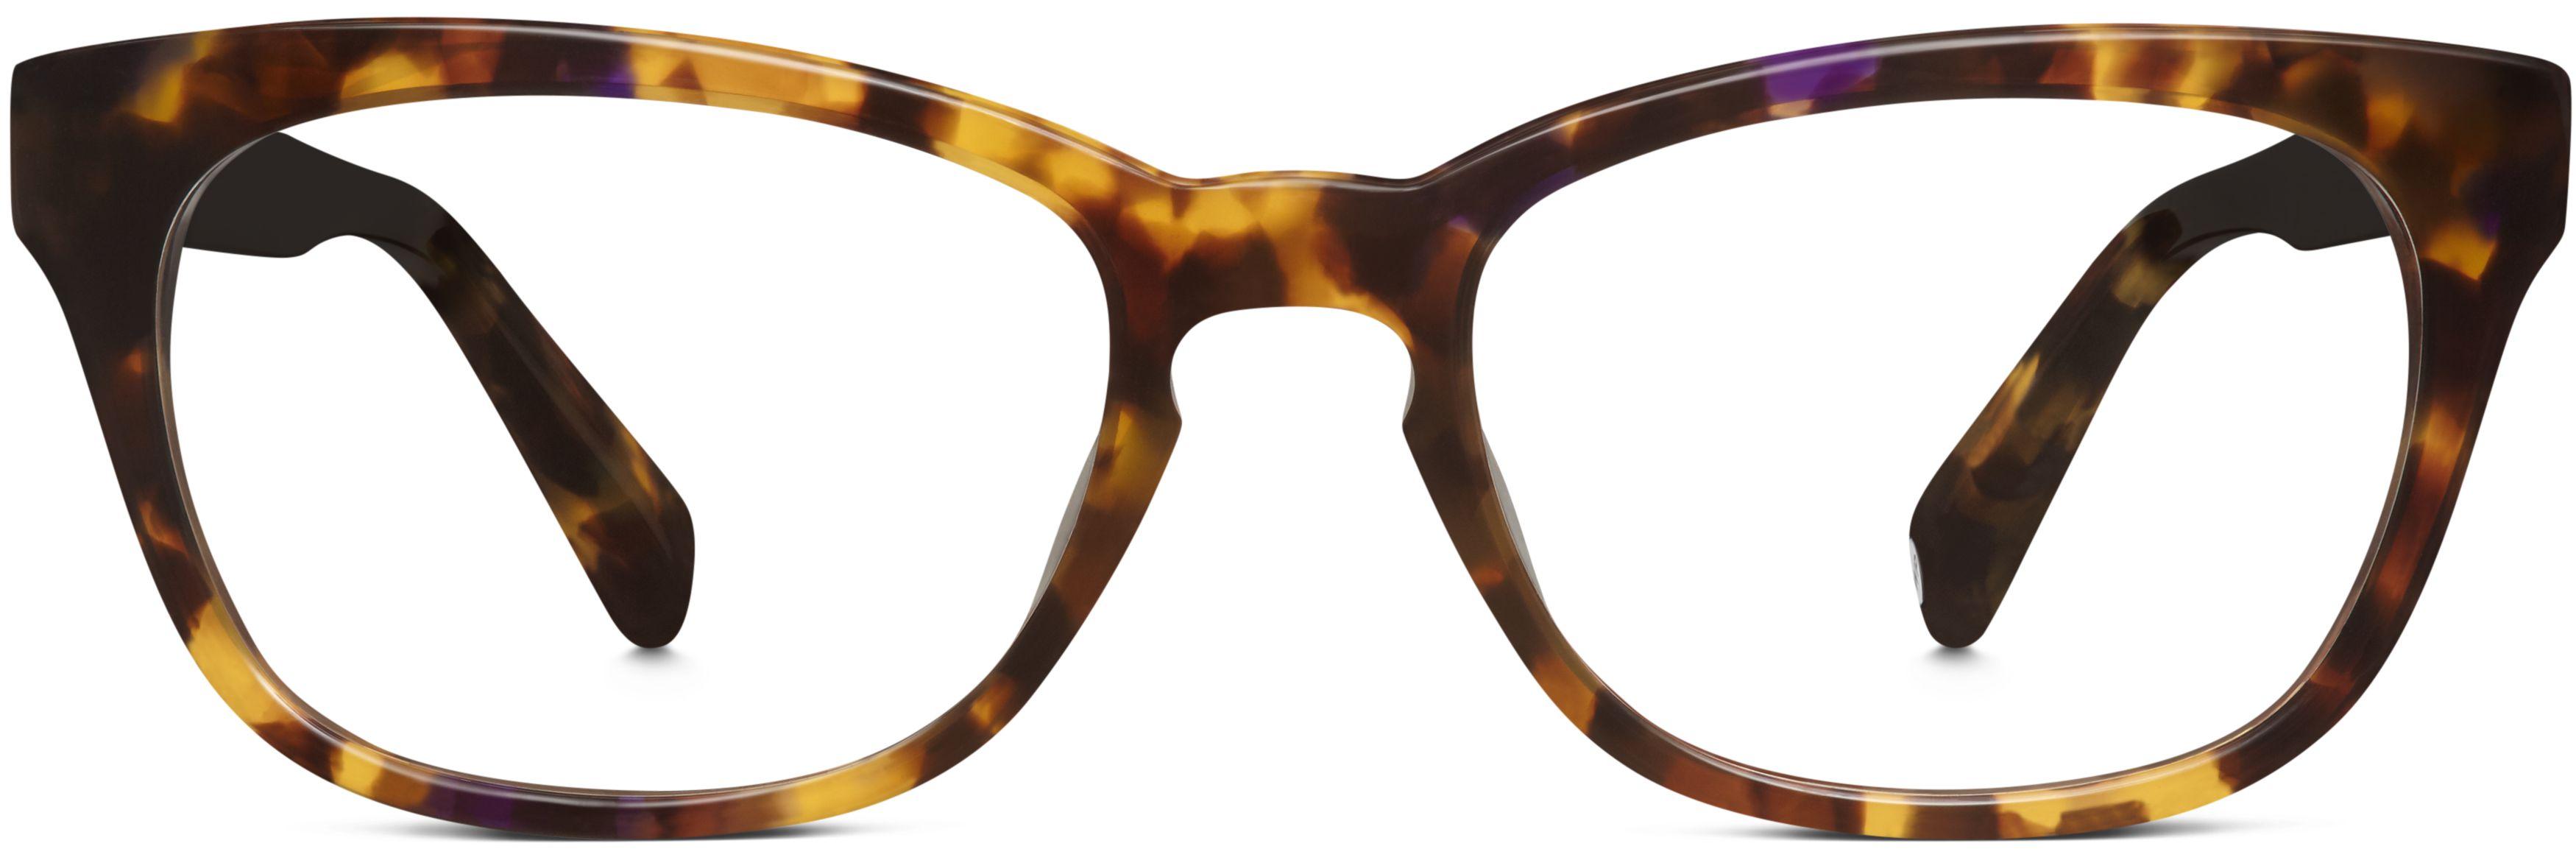 0c9bbe0f52 Finch Eyeglasses in Violet Magnolia for Women